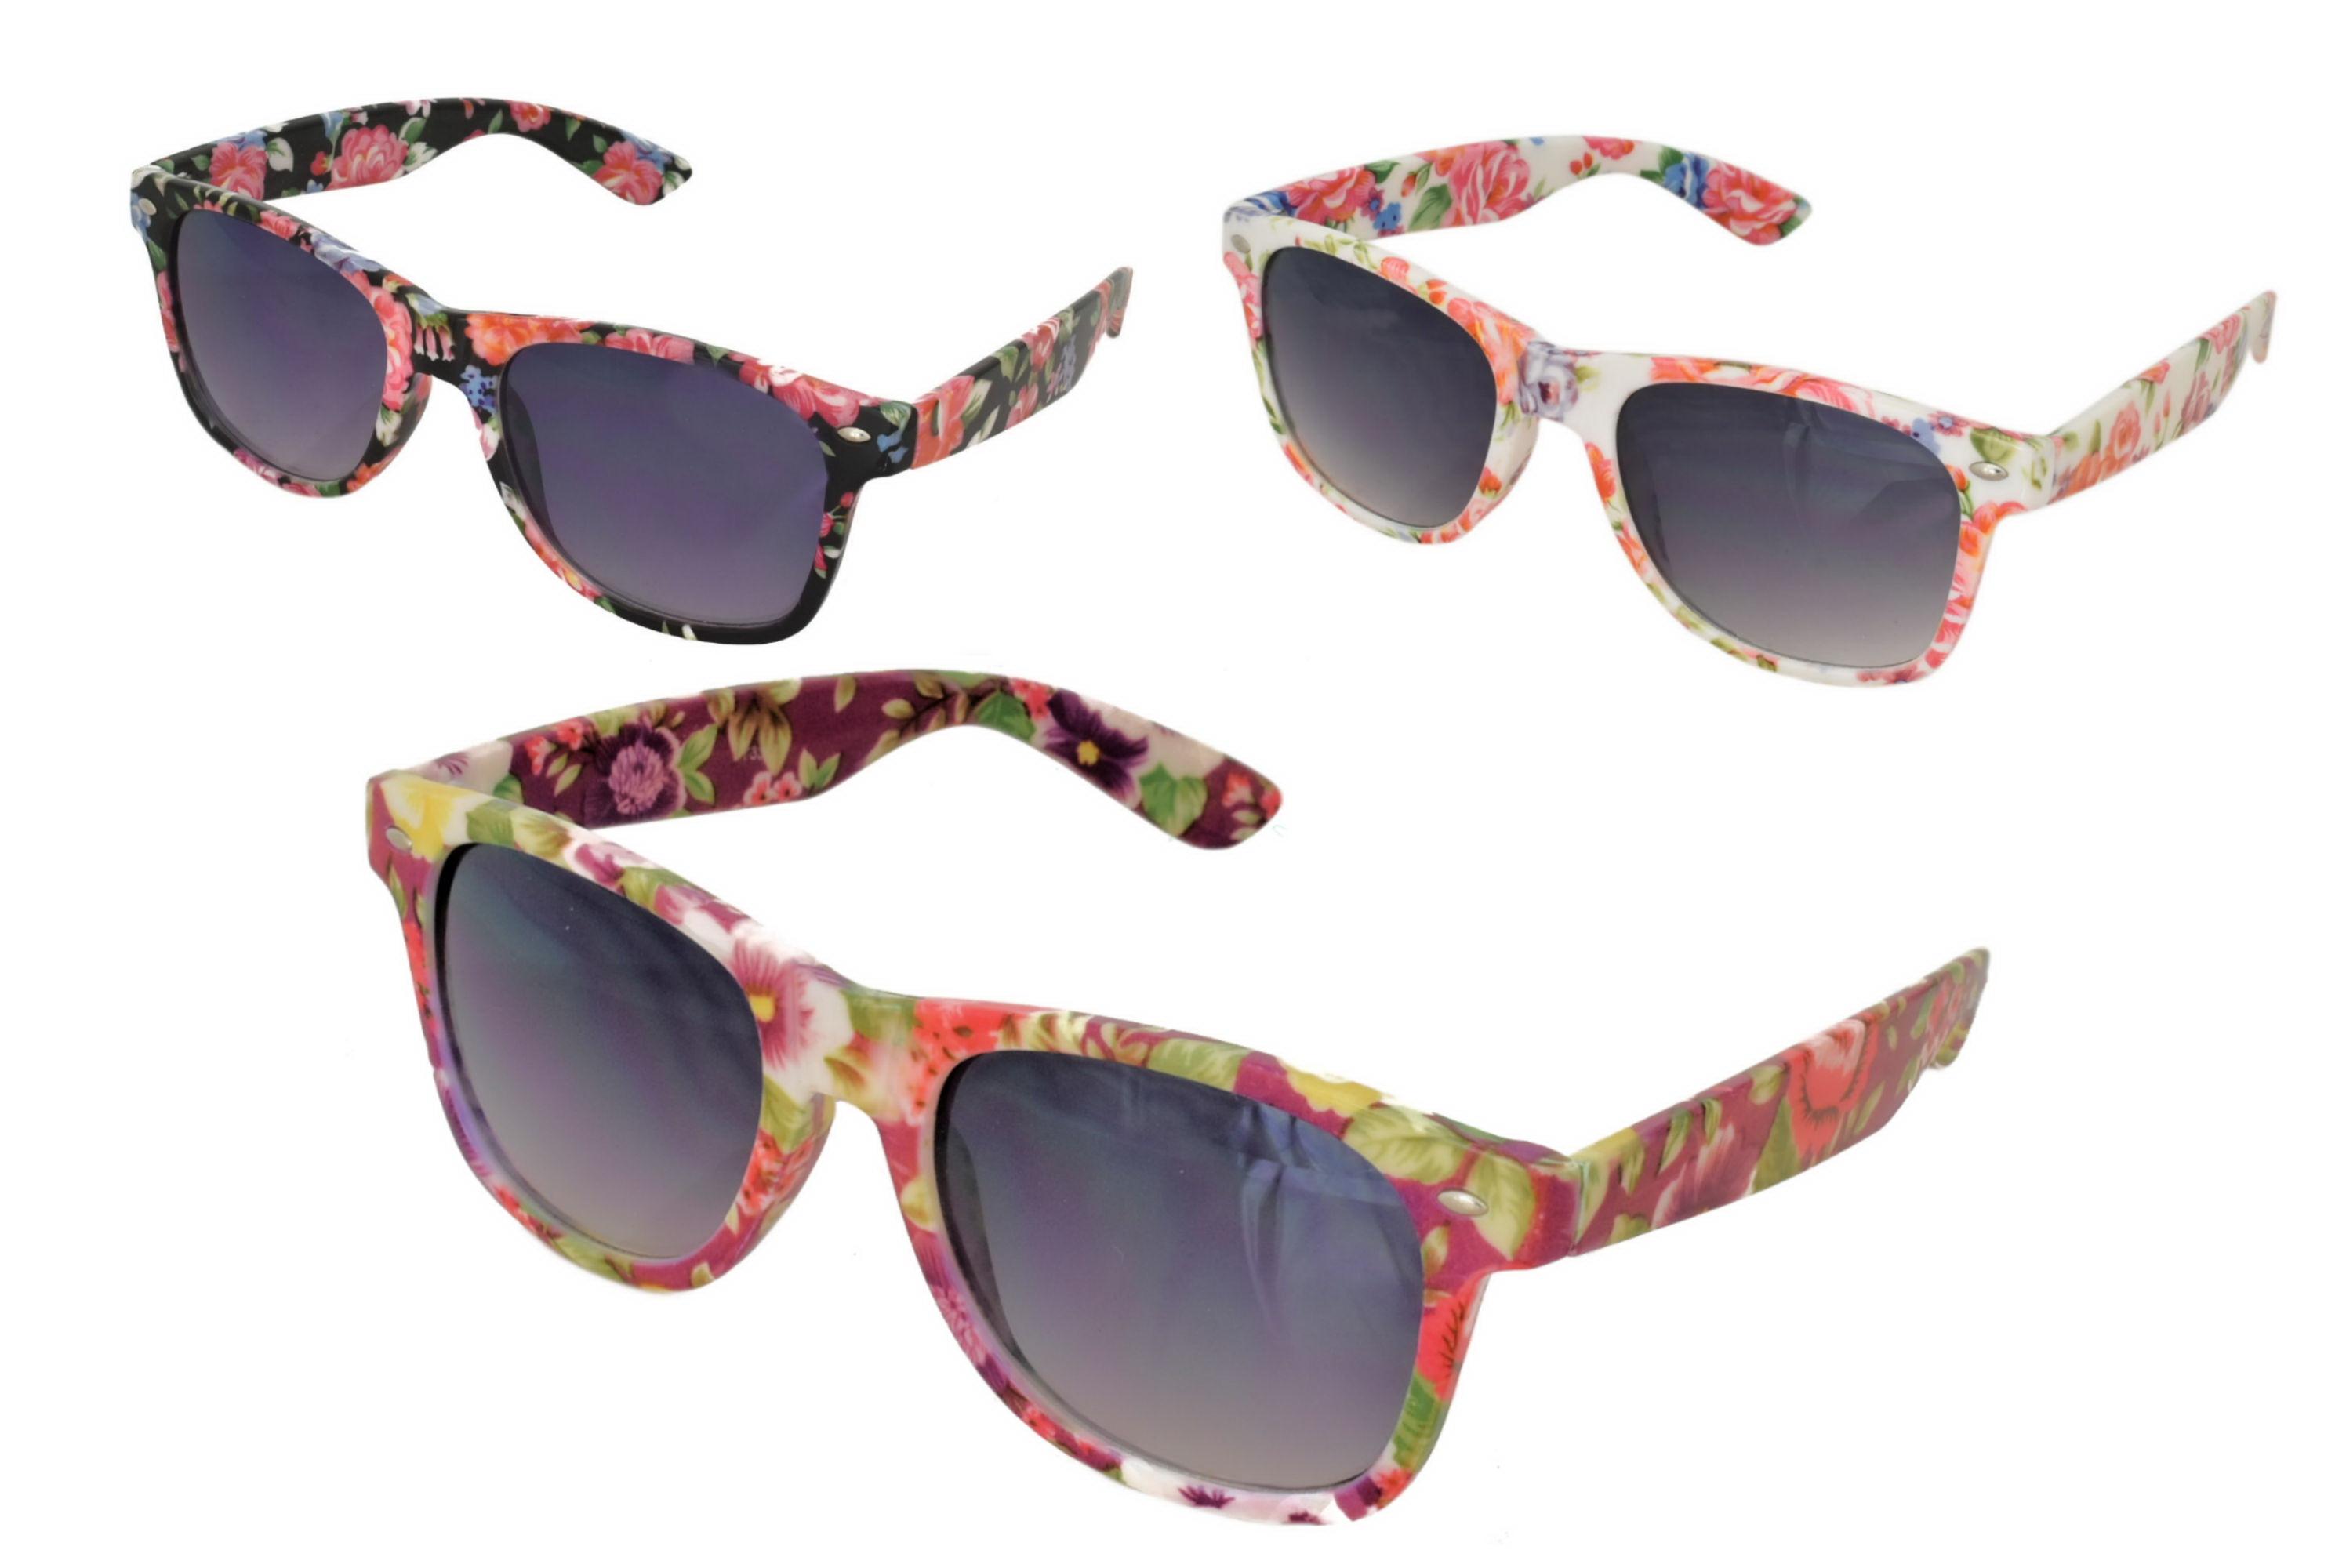 Ladies Plastic Floral Frame Sunglasses - 3 Assorted